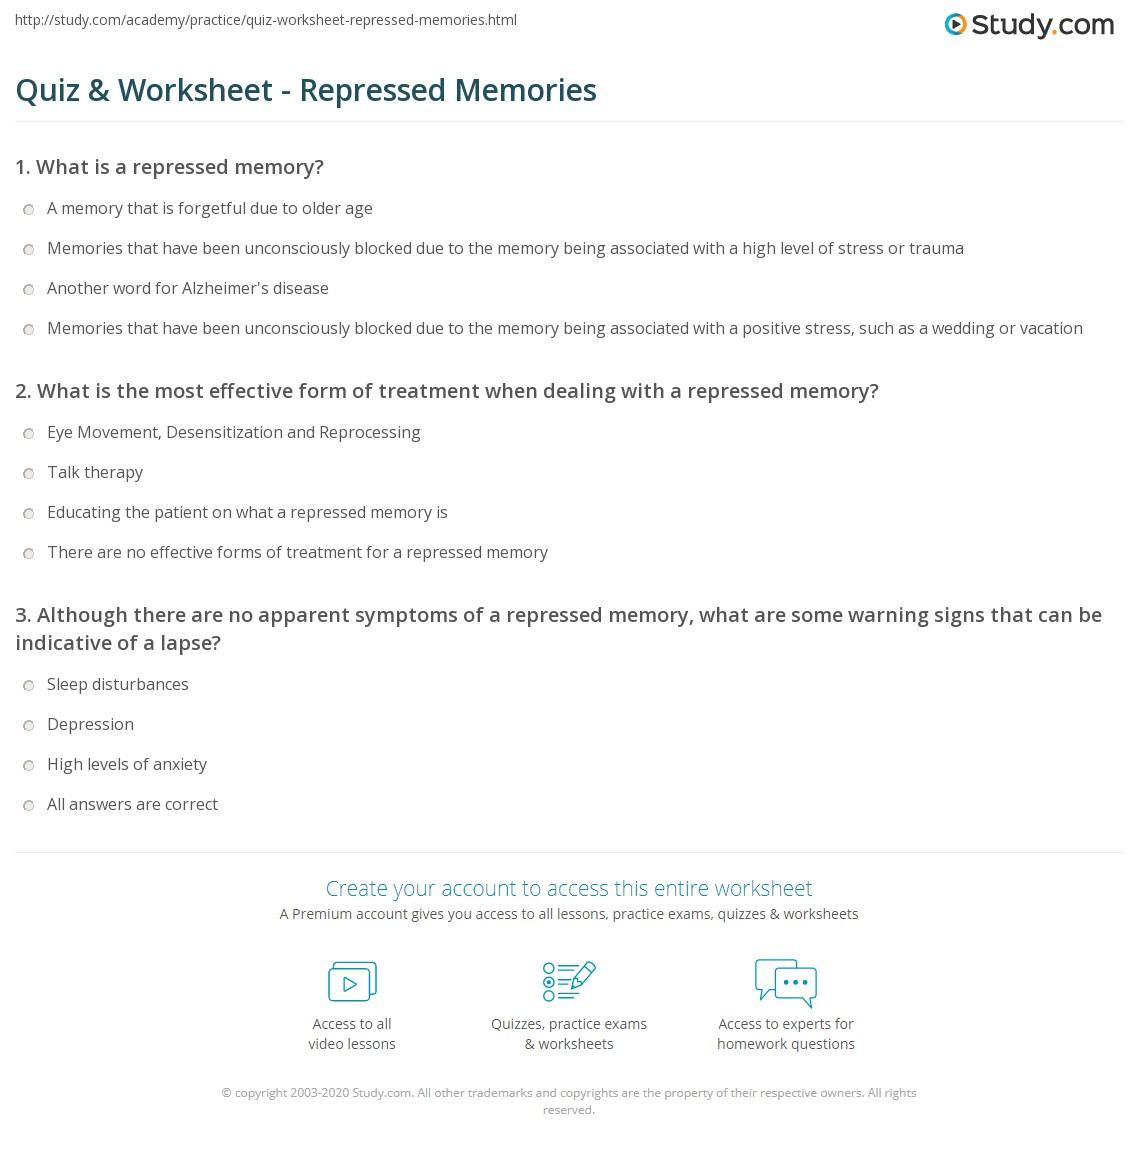 quiz worksheet repressed memories. Black Bedroom Furniture Sets. Home Design Ideas